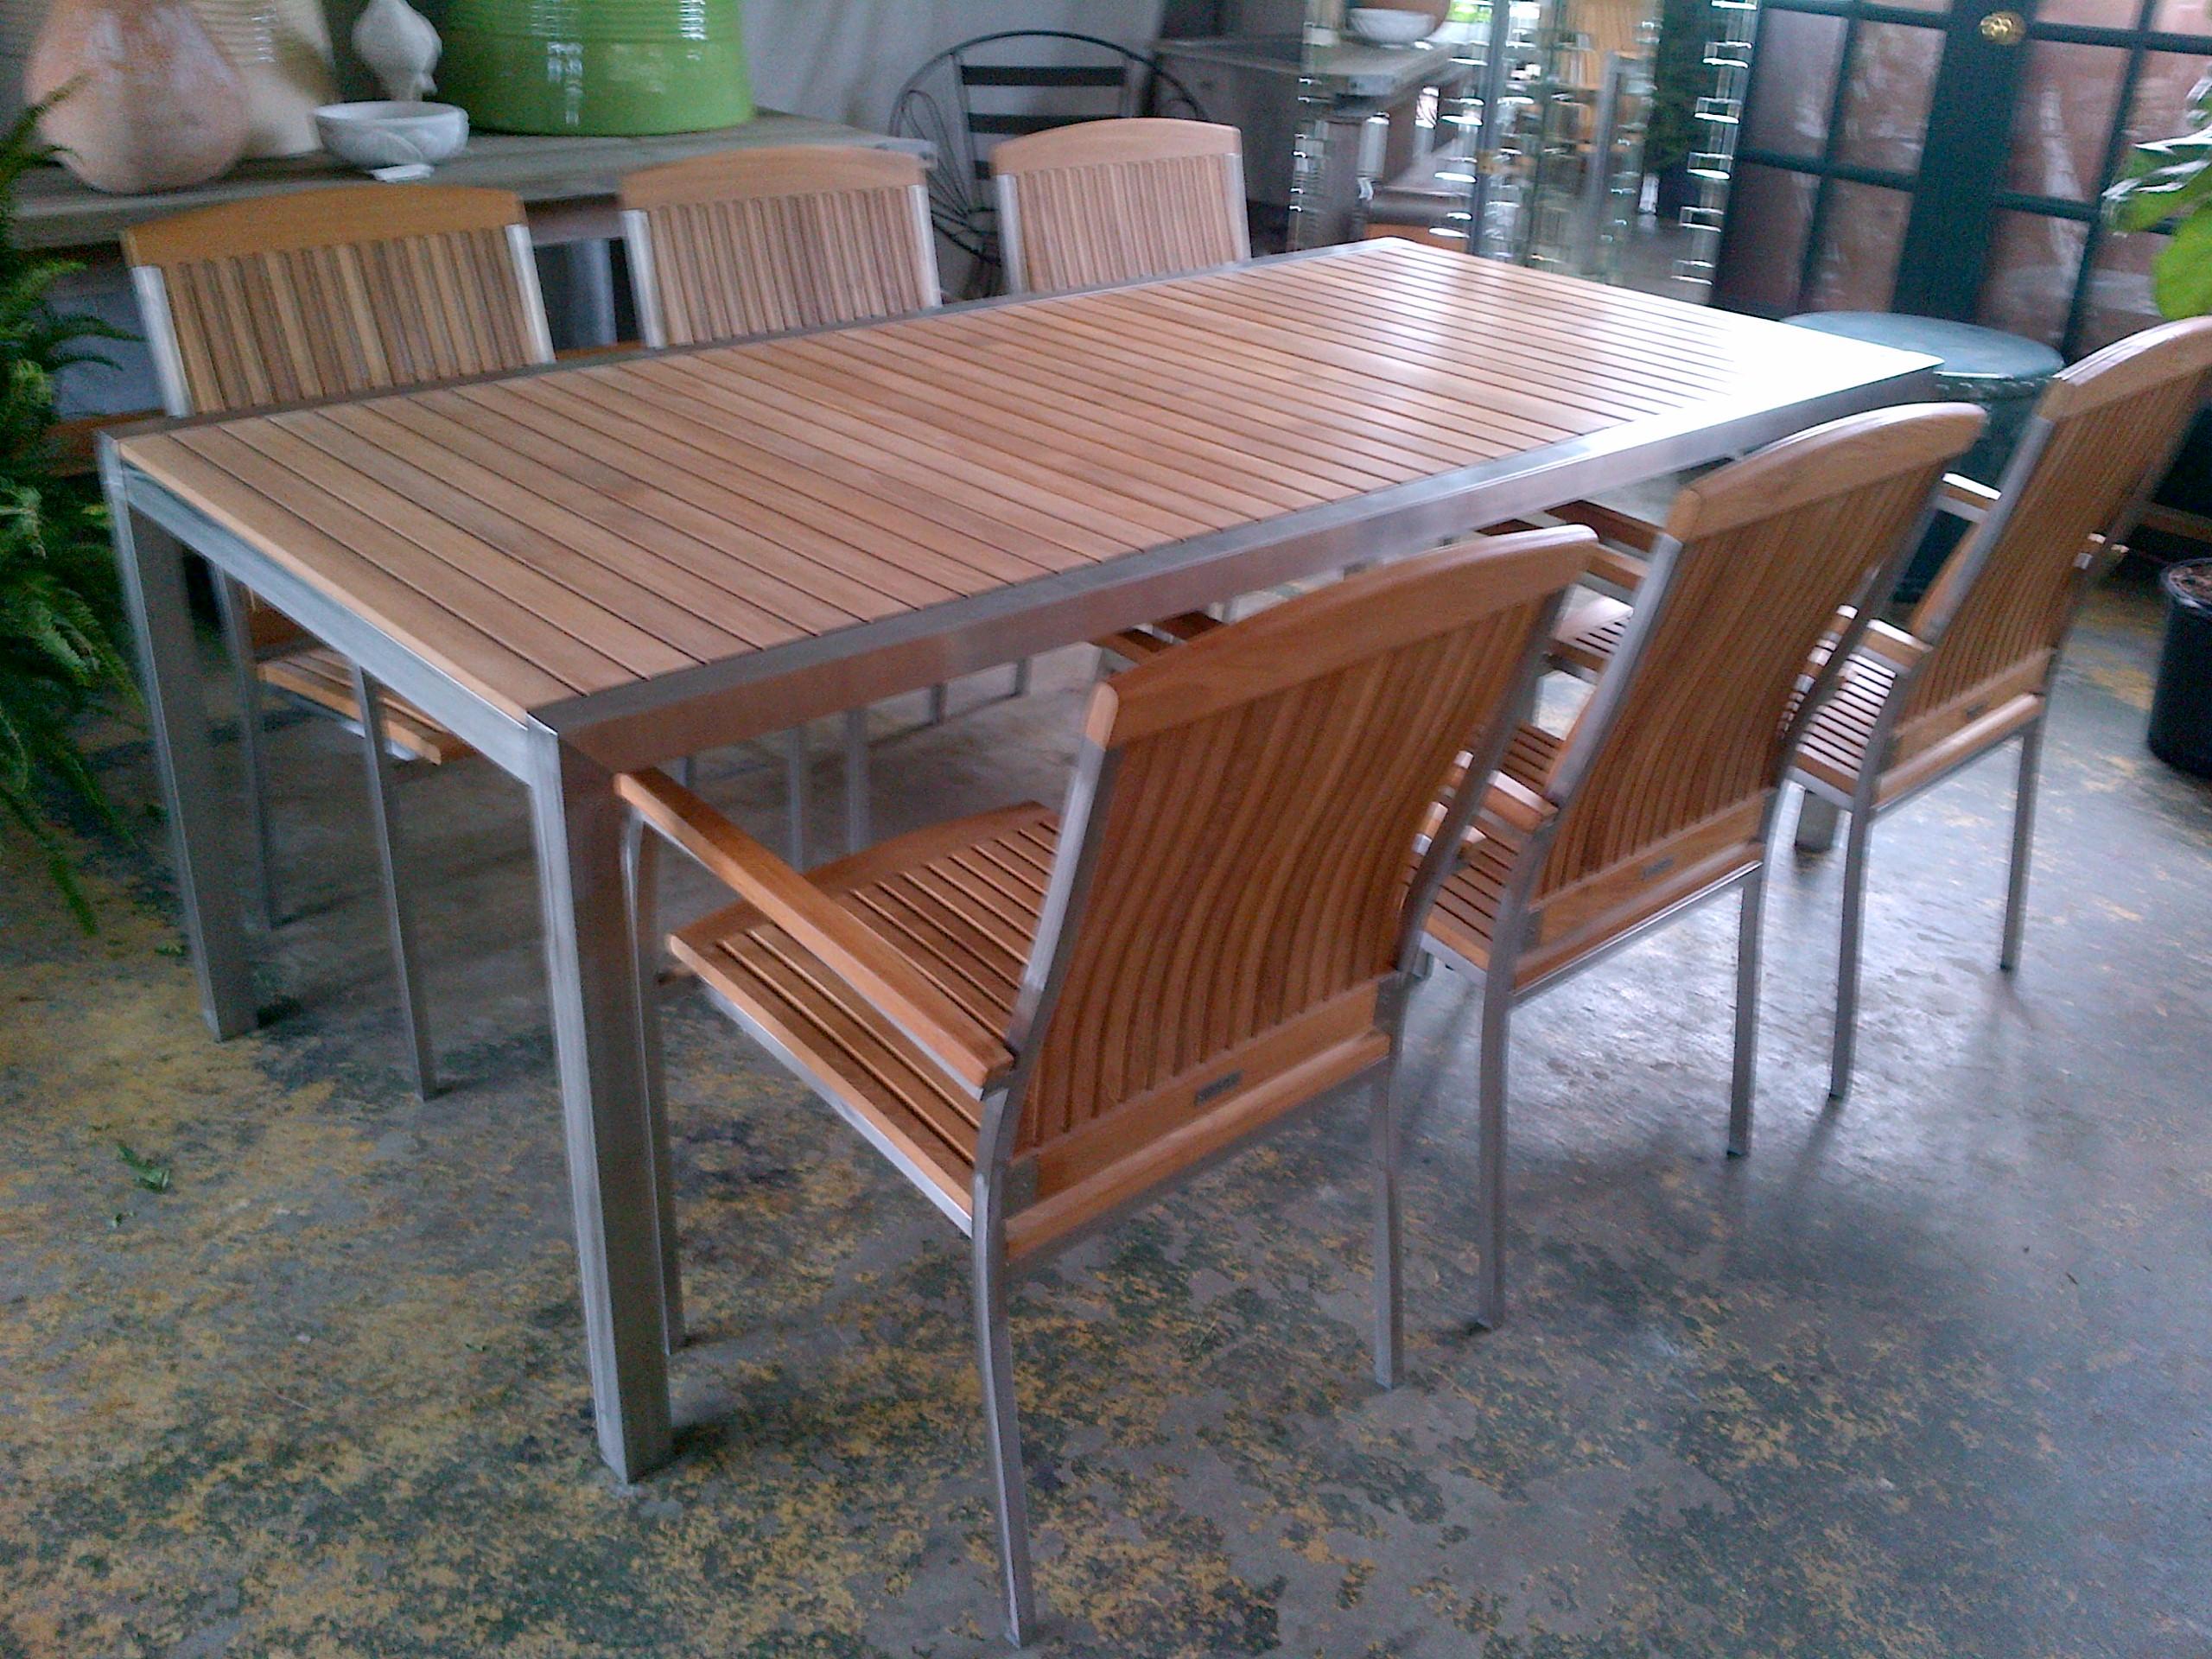 Teak Kitchen Table Teak dining table with stainless steel frame mecox teak dining table with stainless steel frame workwithnaturefo